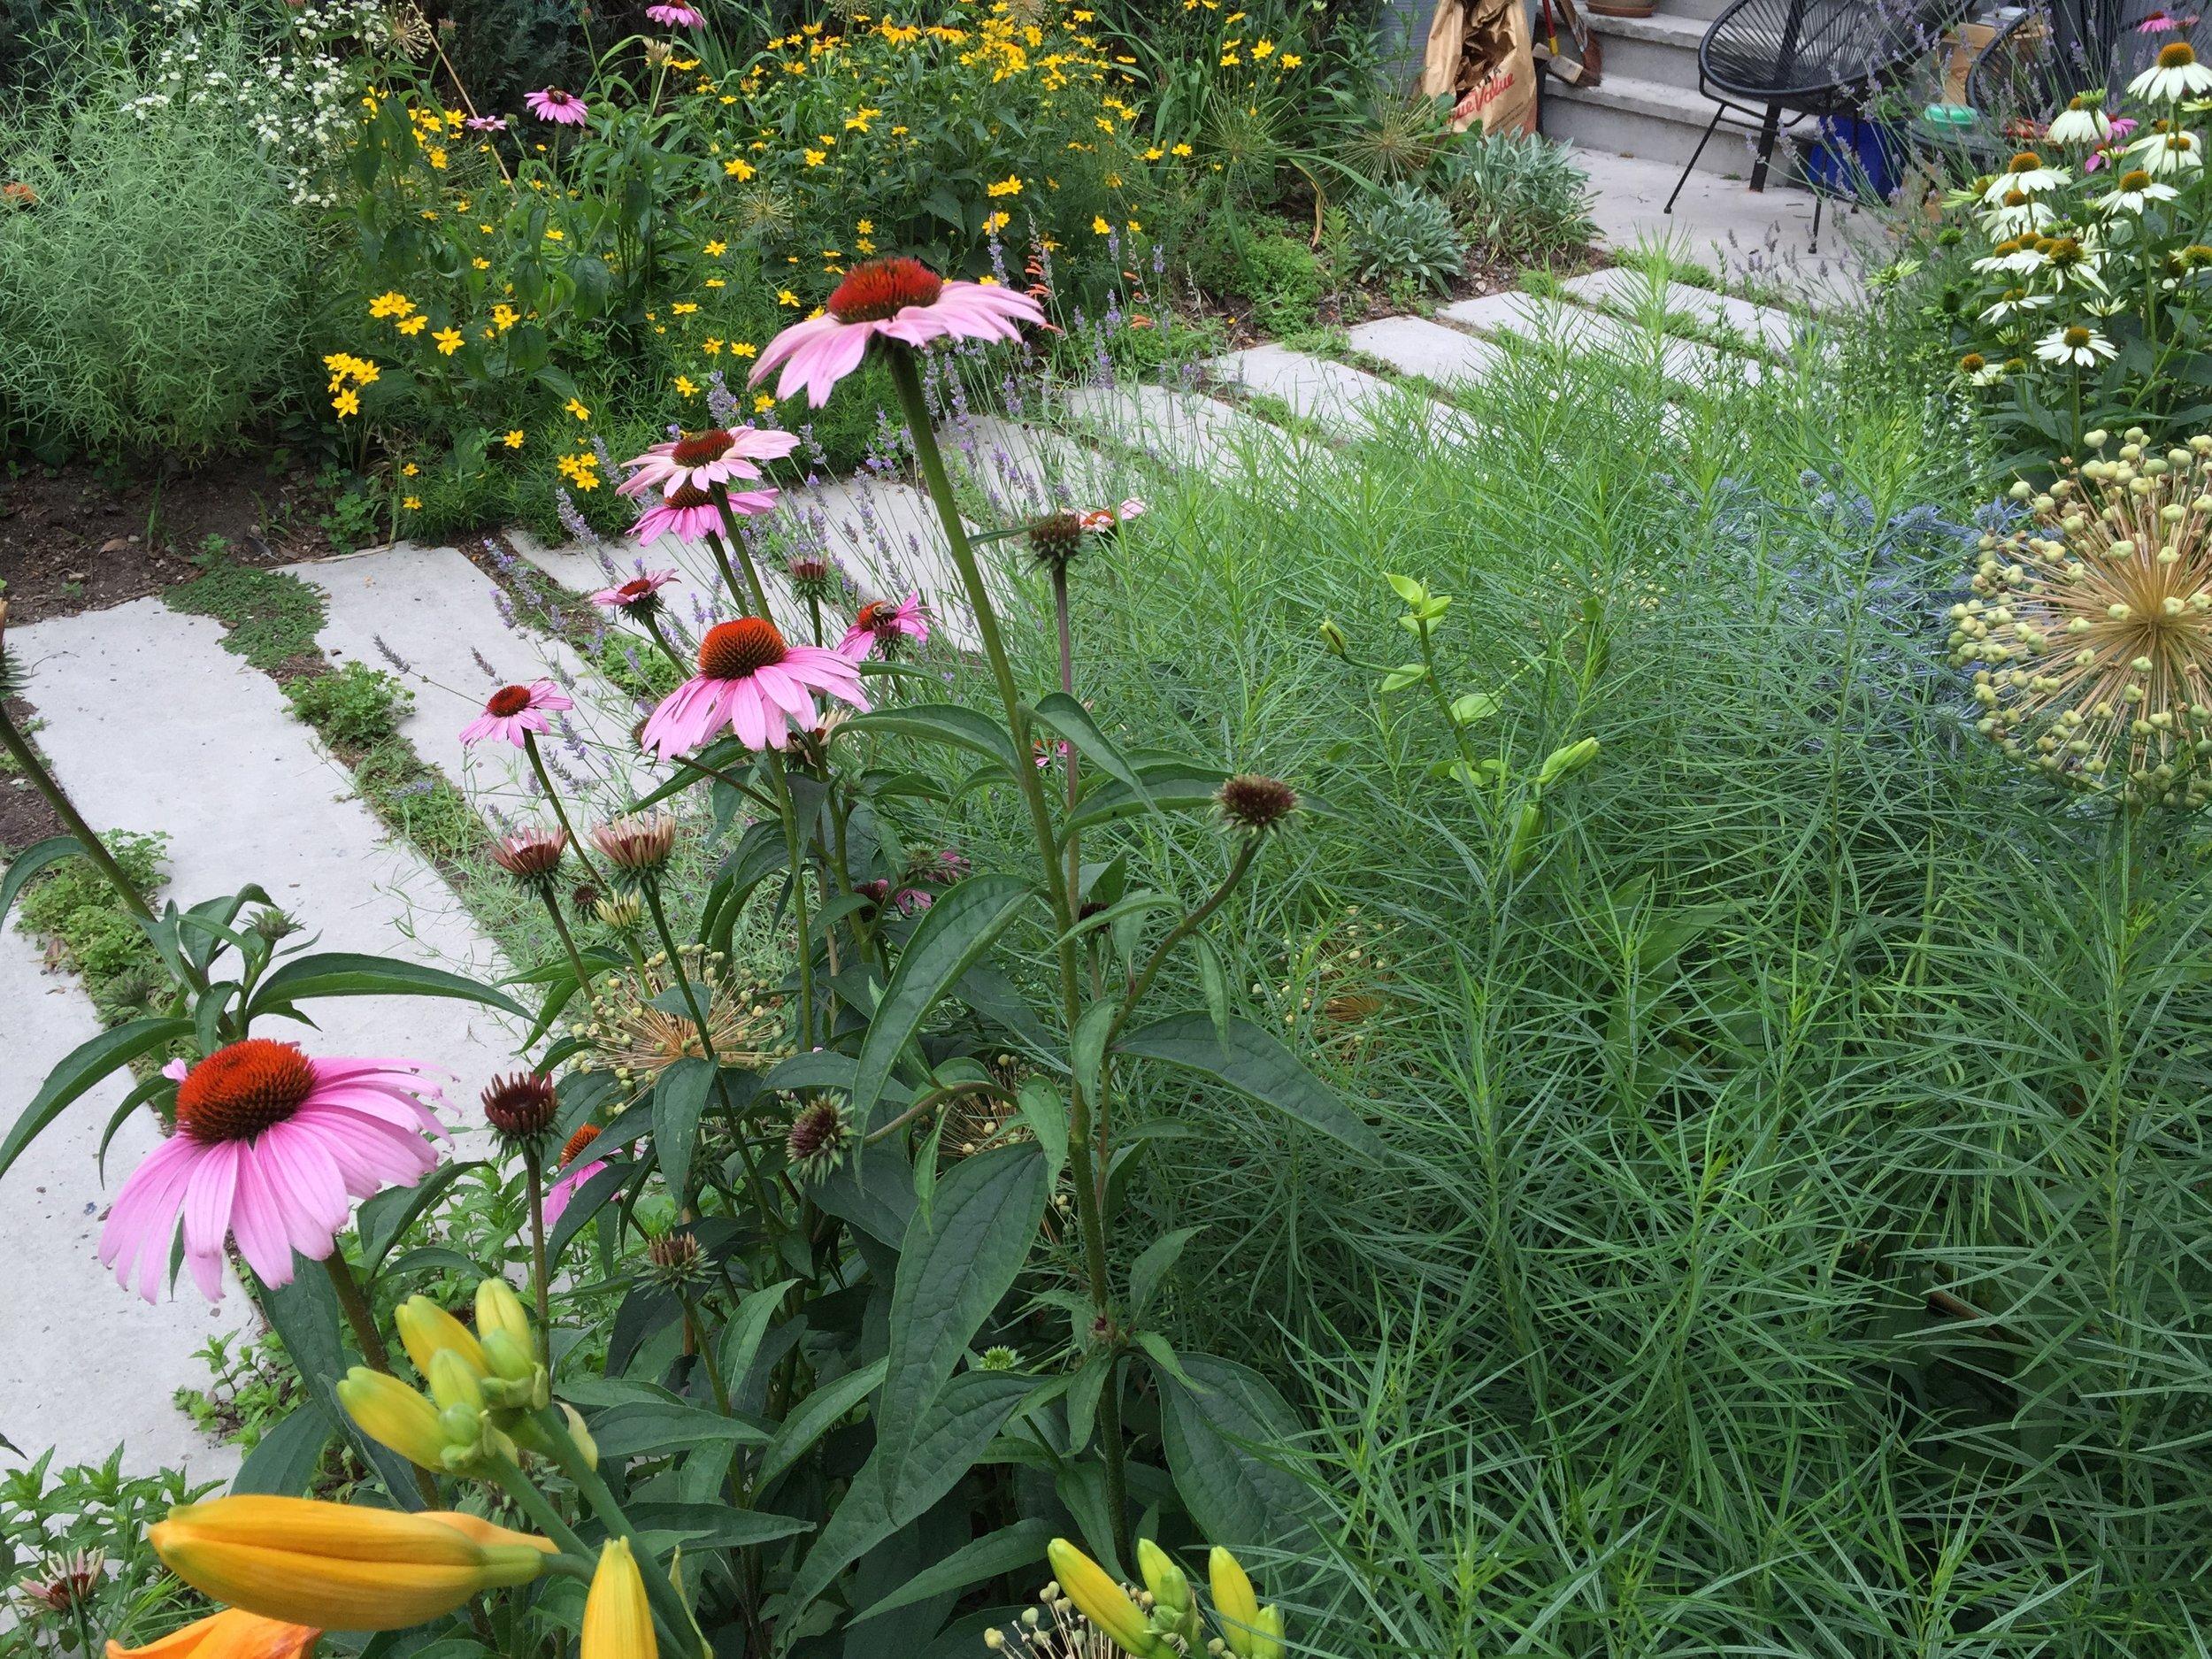 brooklyn_plant_studio_garden_13.jpg